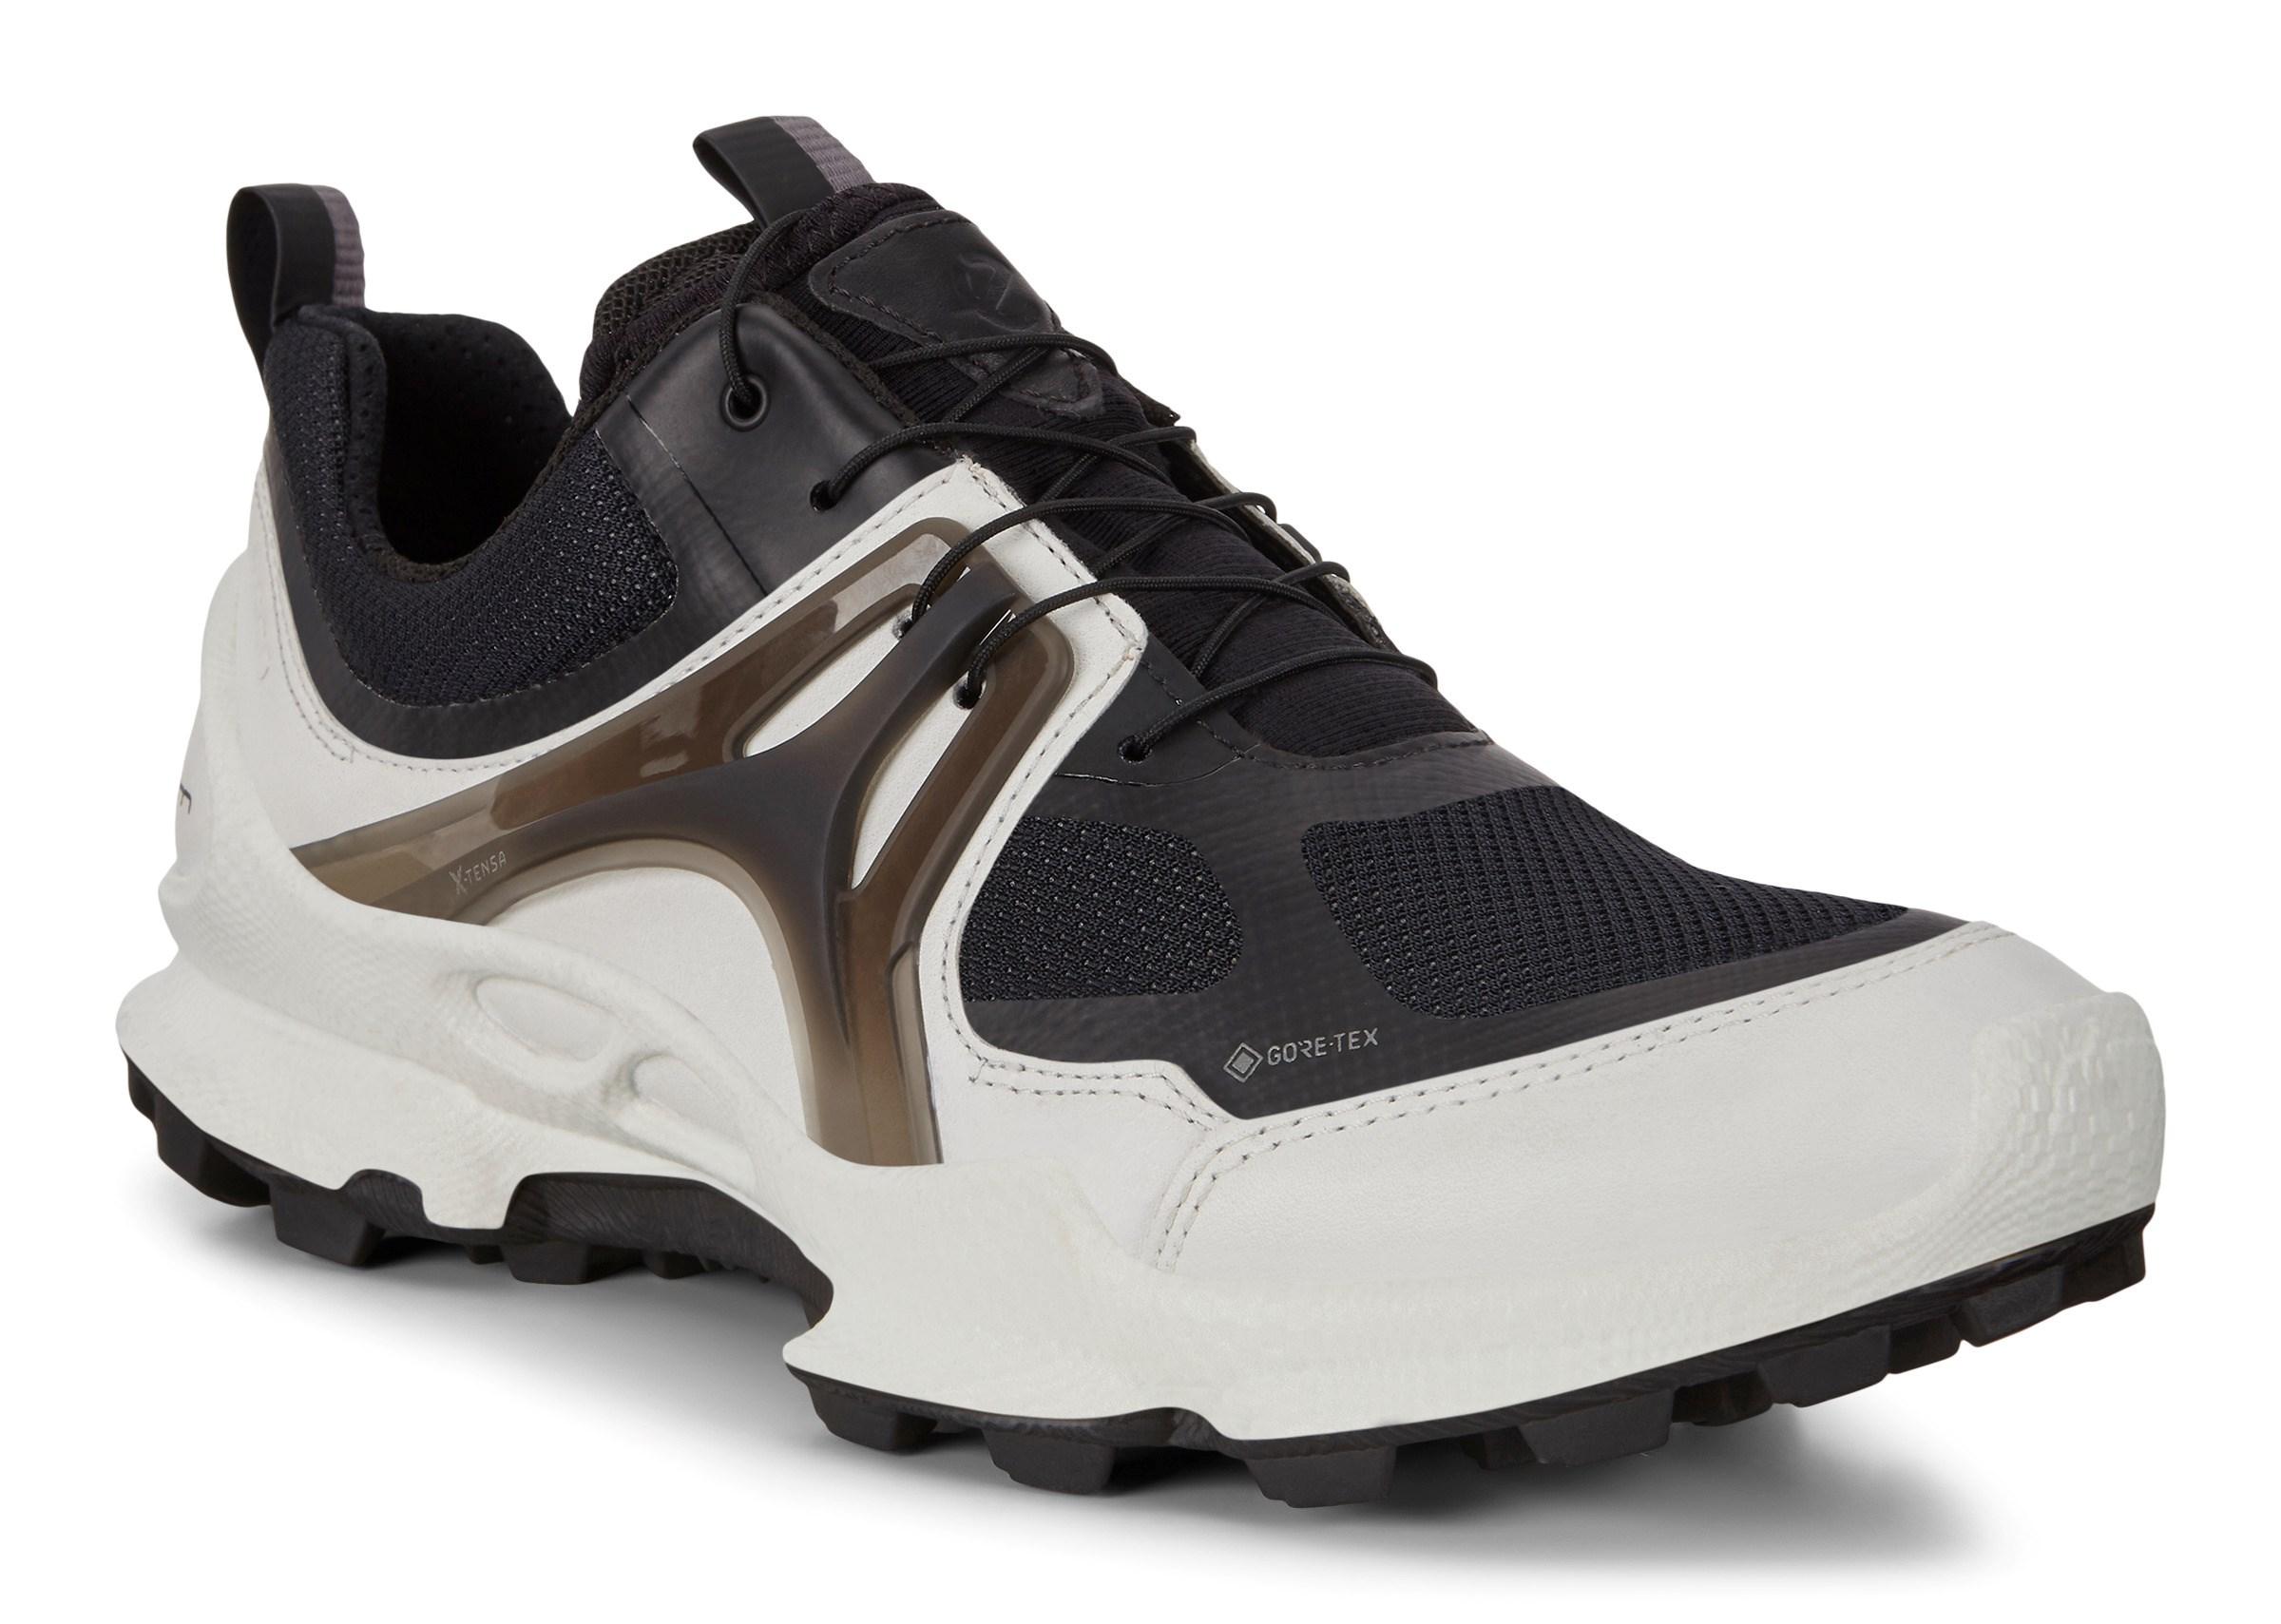 Officiell Svart Skor Ecco Aurora Sneakers Herr Online